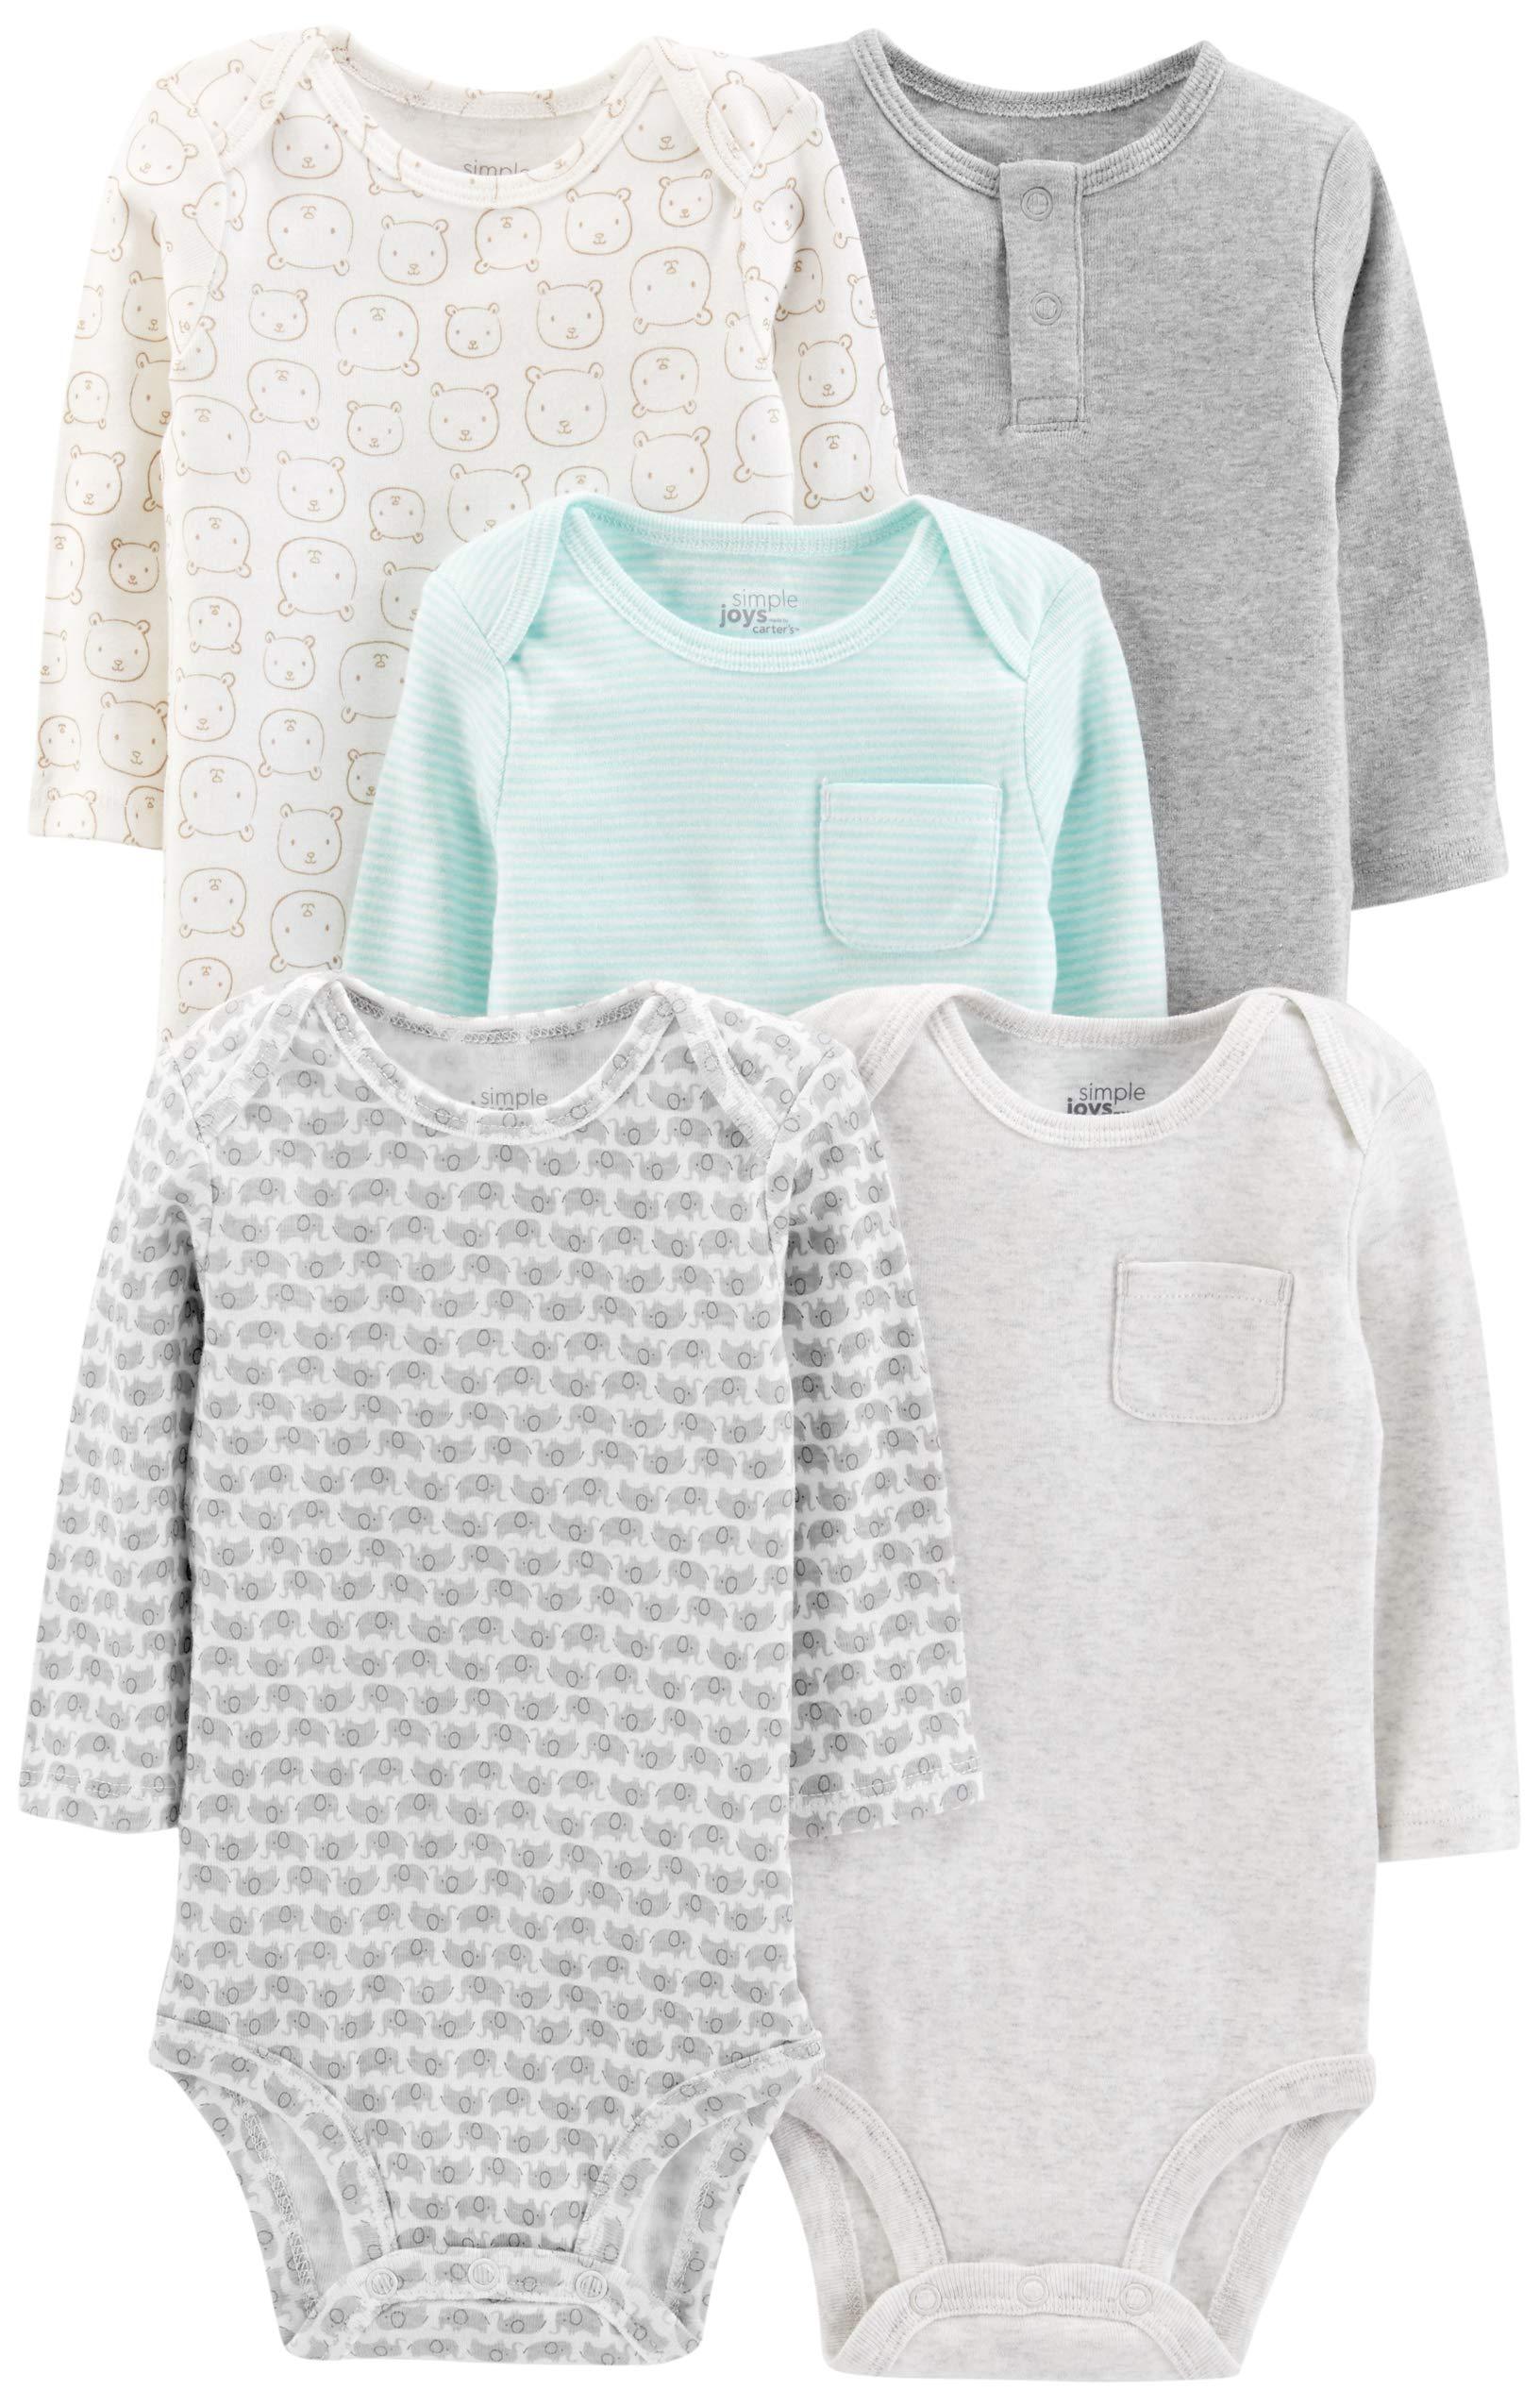 Simple Joys by Carter's Baby 5-Pack Long-Sleeve Bodysuit, Grey/Blue Stripe, 3-6 Months